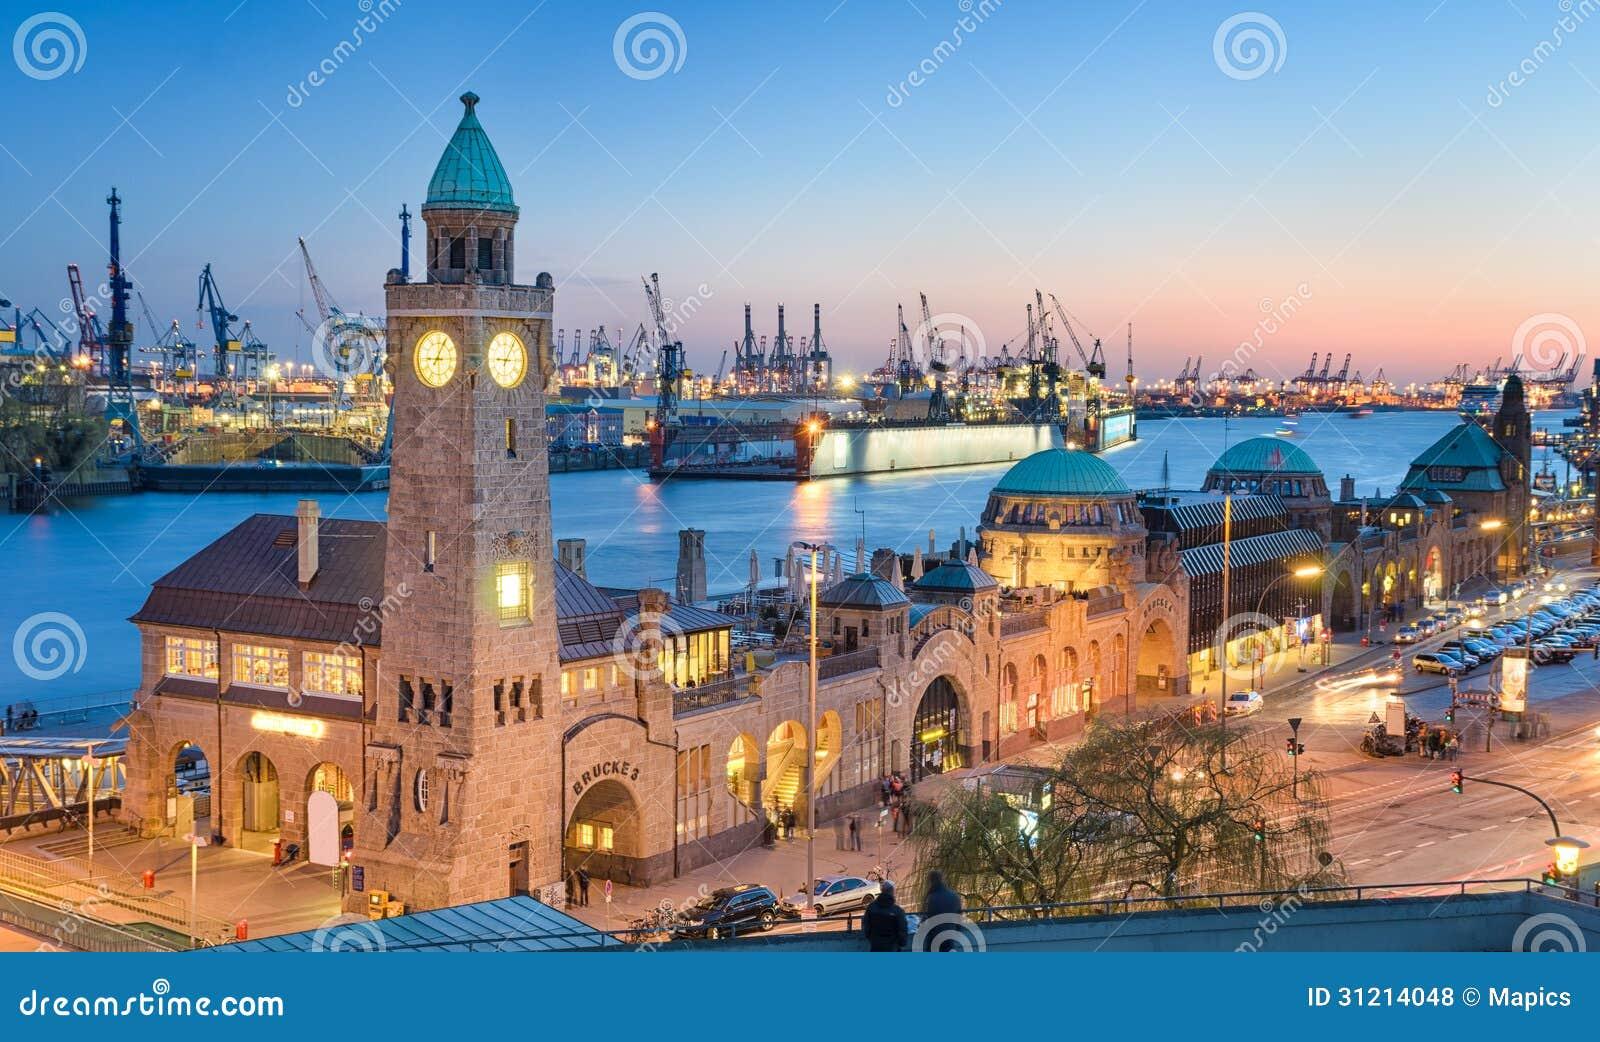 Landungsbruecken and the harbor in Hamburg, Germany